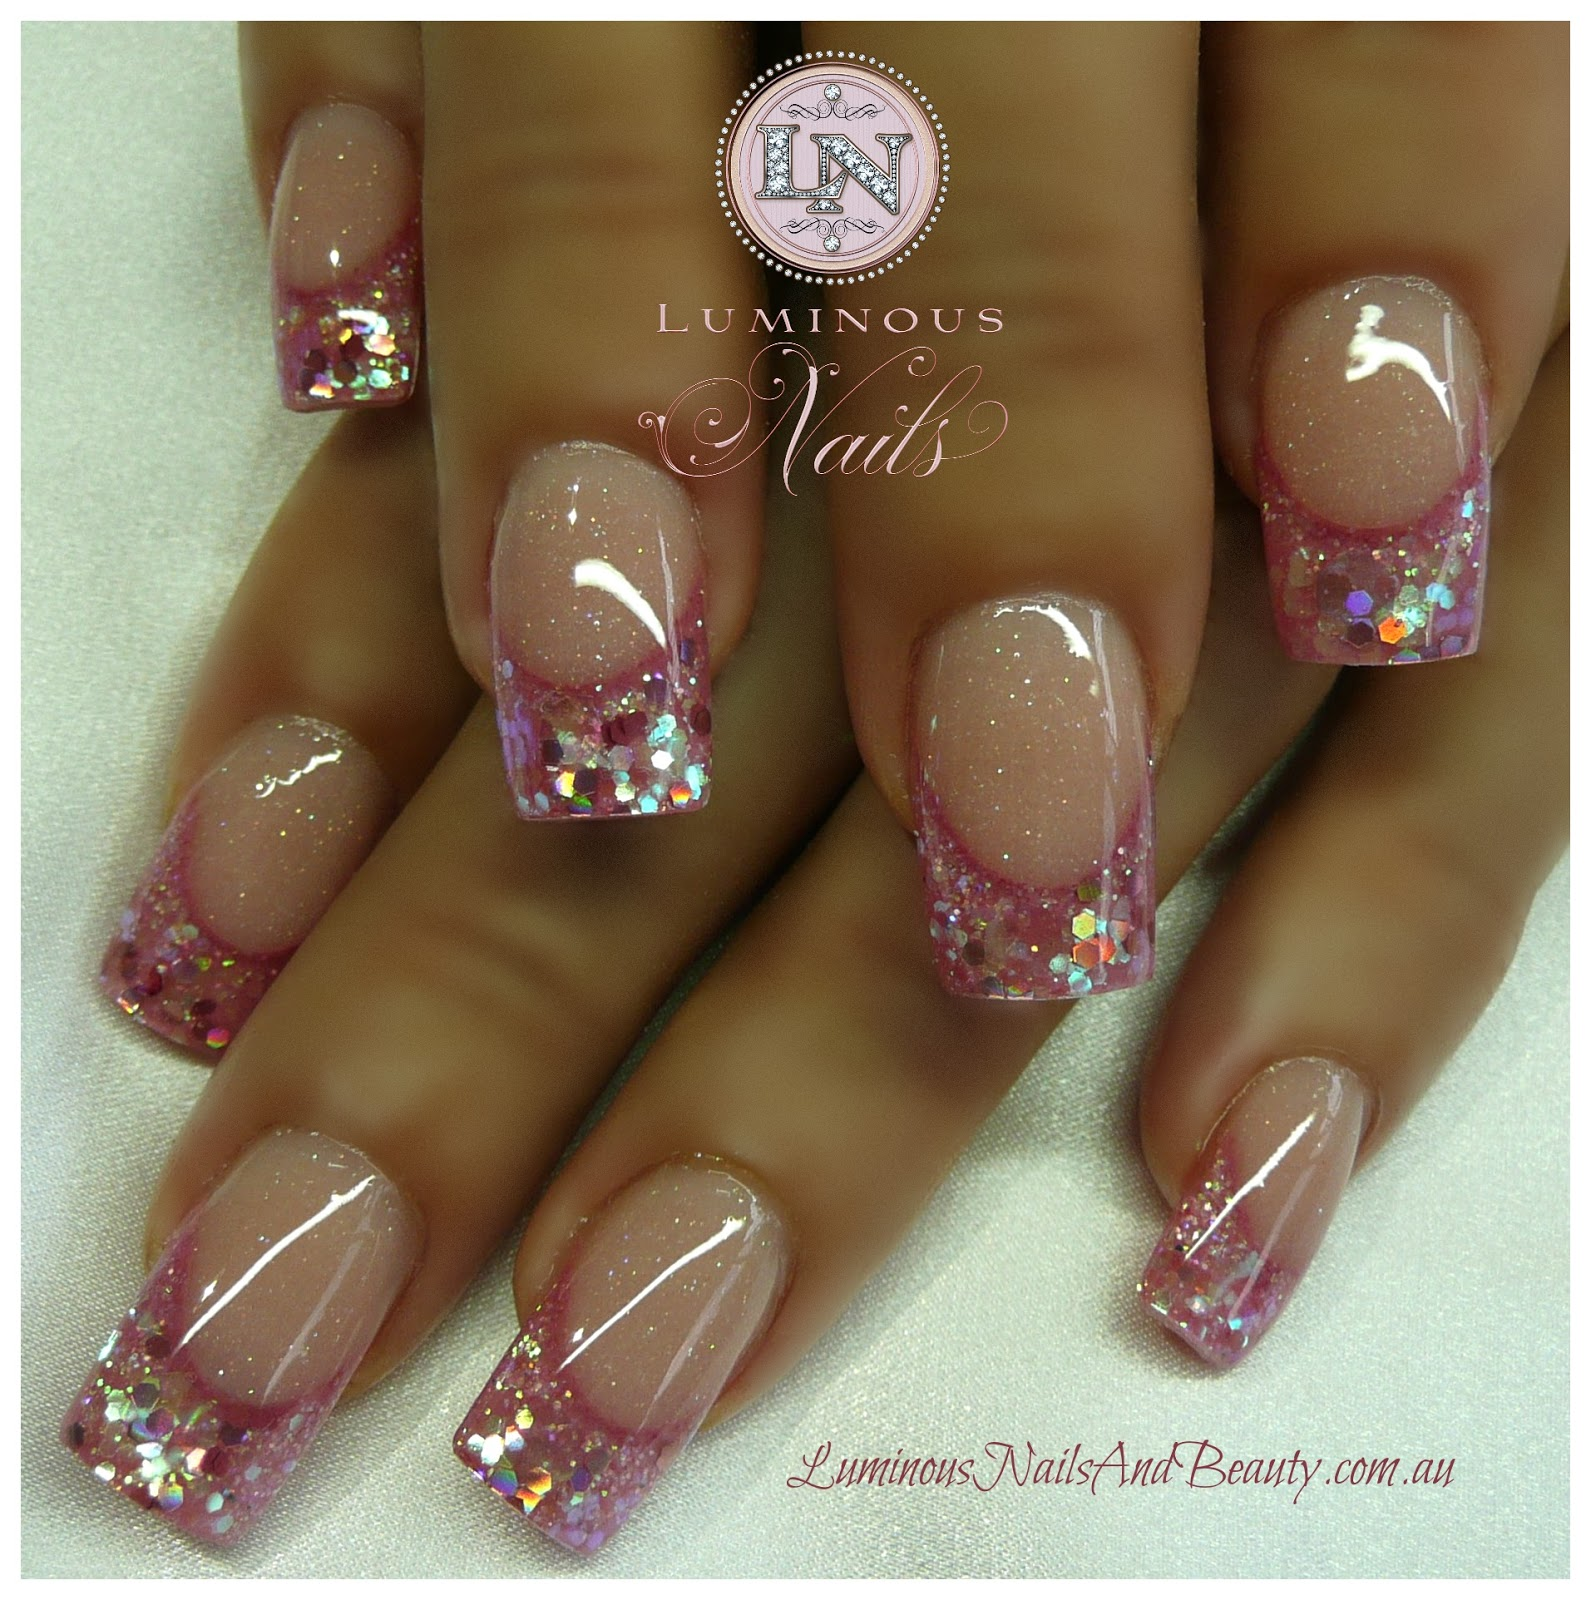 Glitter Nail Art Designs: Luminous Nails: December 2012